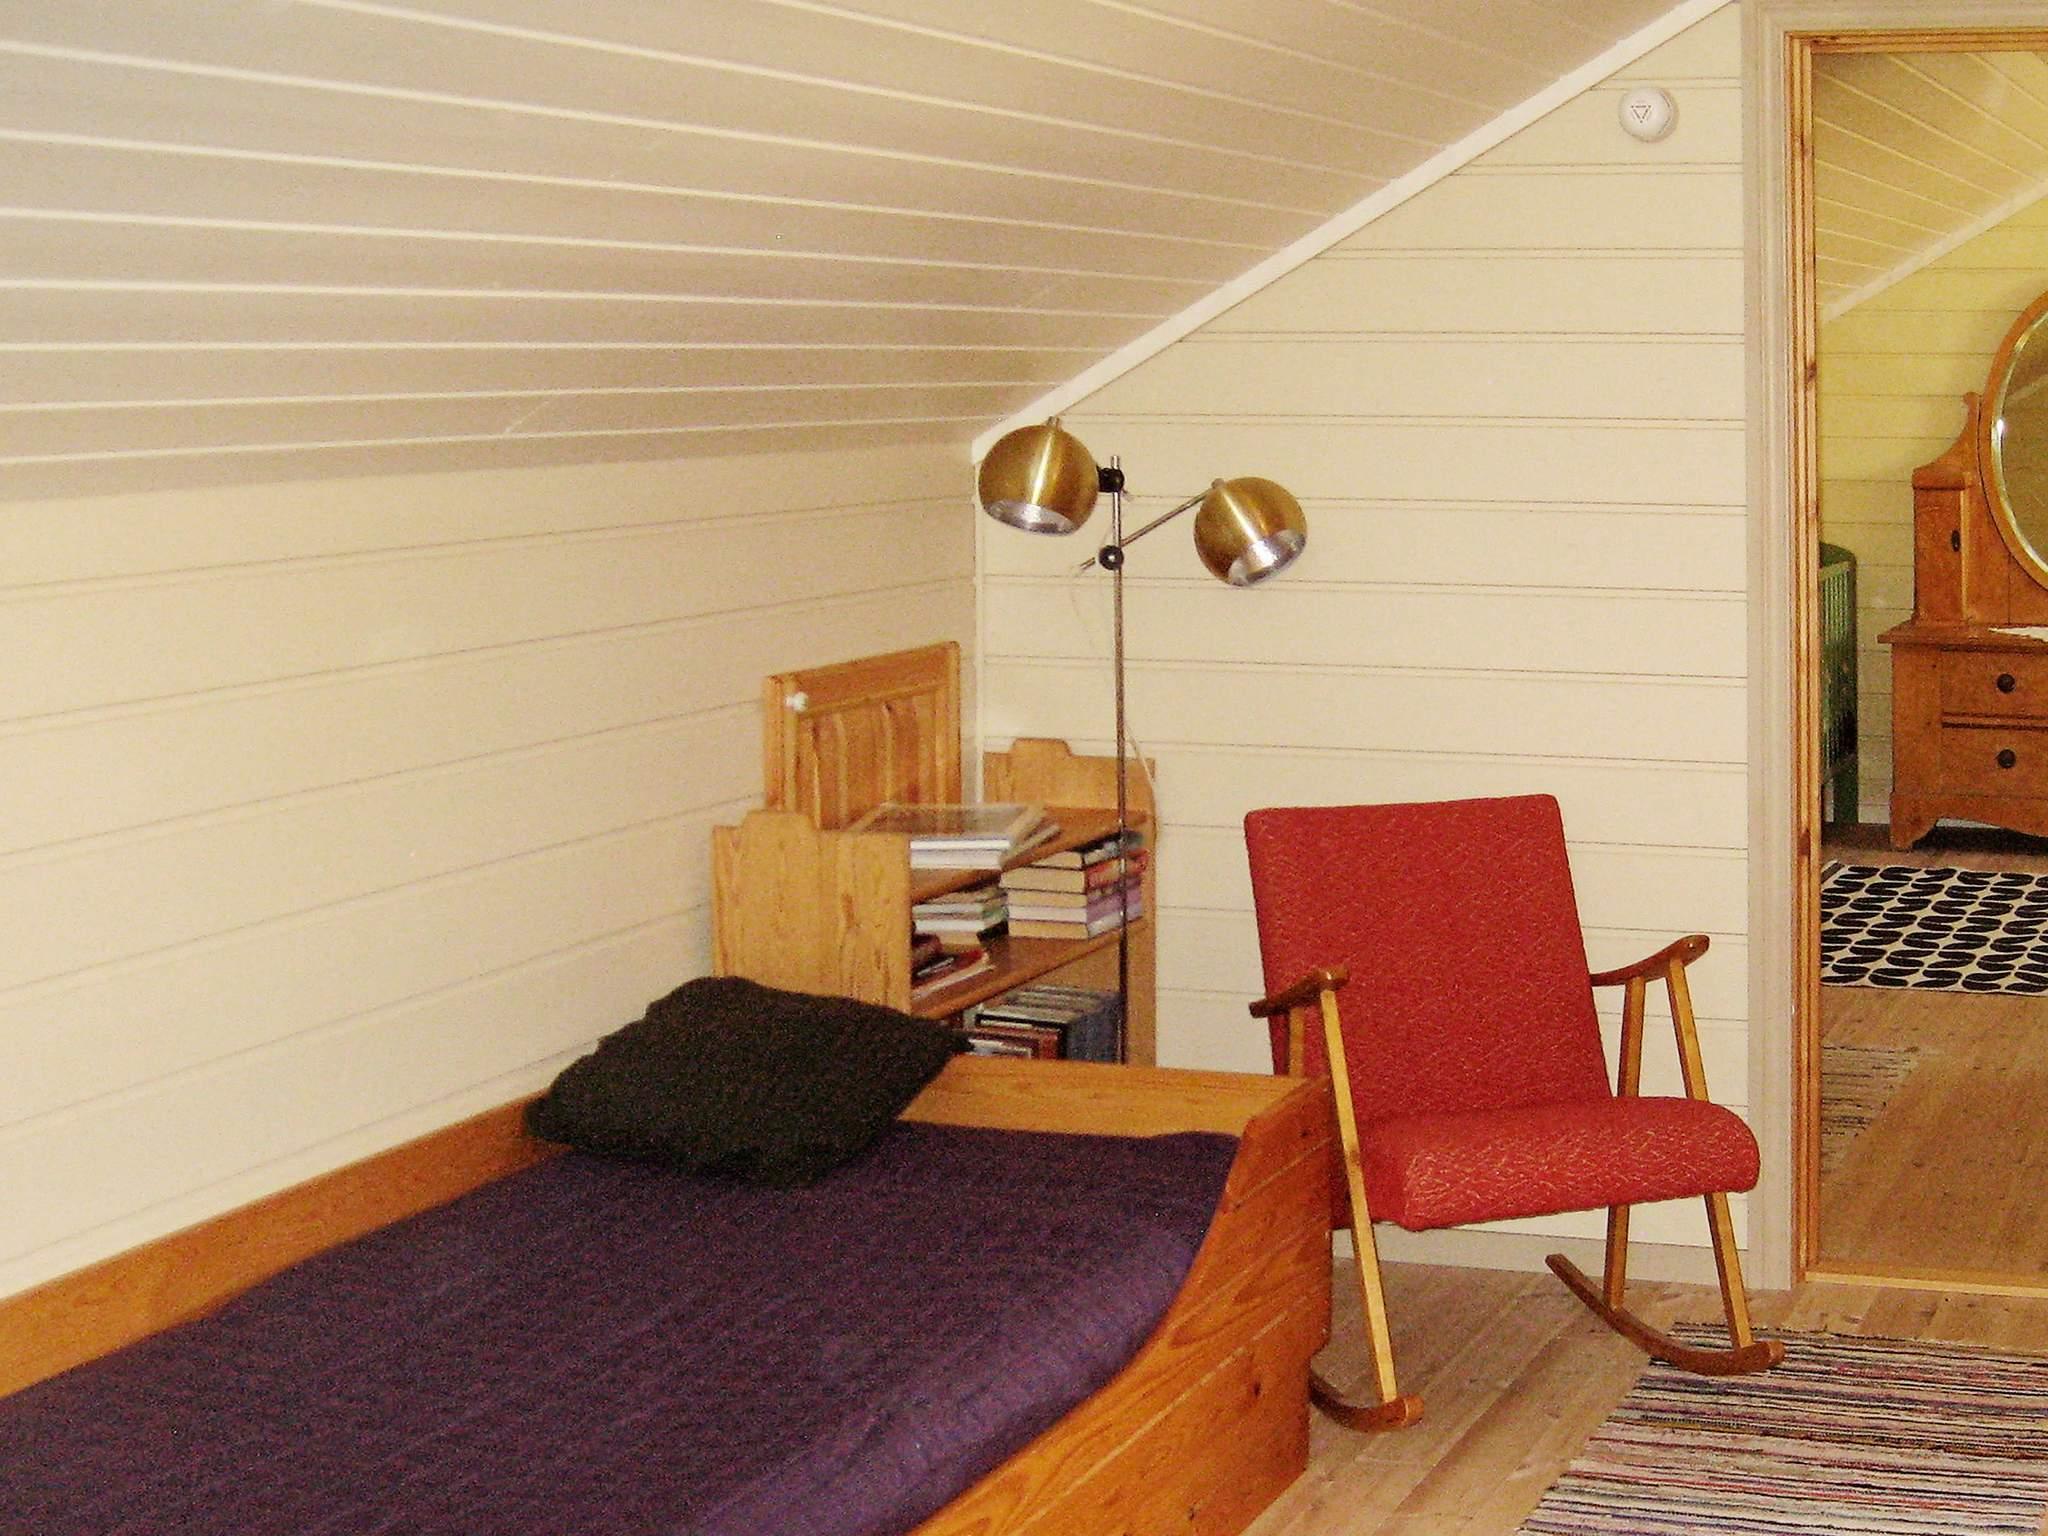 Ferienhaus Fosen (594822), Follafoss, Tröndelag Nord - Trondheimfjord Nord, Mittelnorwegen, Norwegen, Bild 15